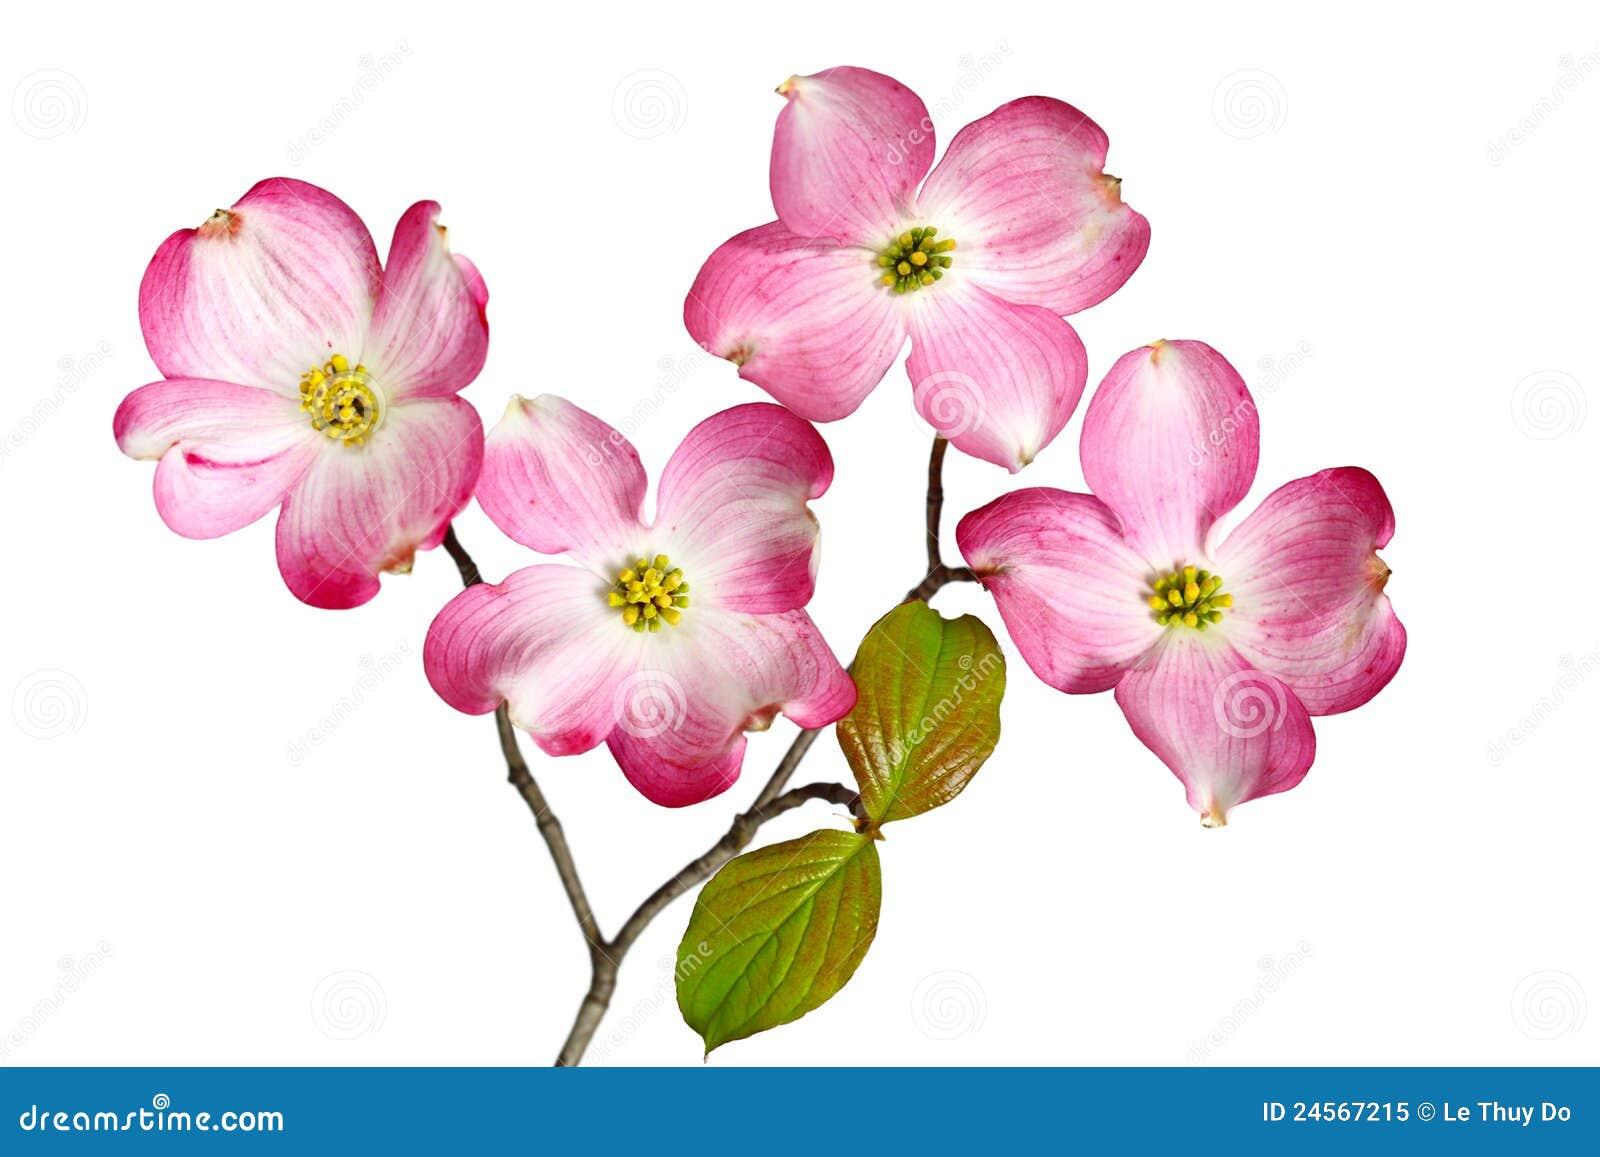 Red Dogwood Blossom Stock Image Image Of Dogwood Garden 24567215